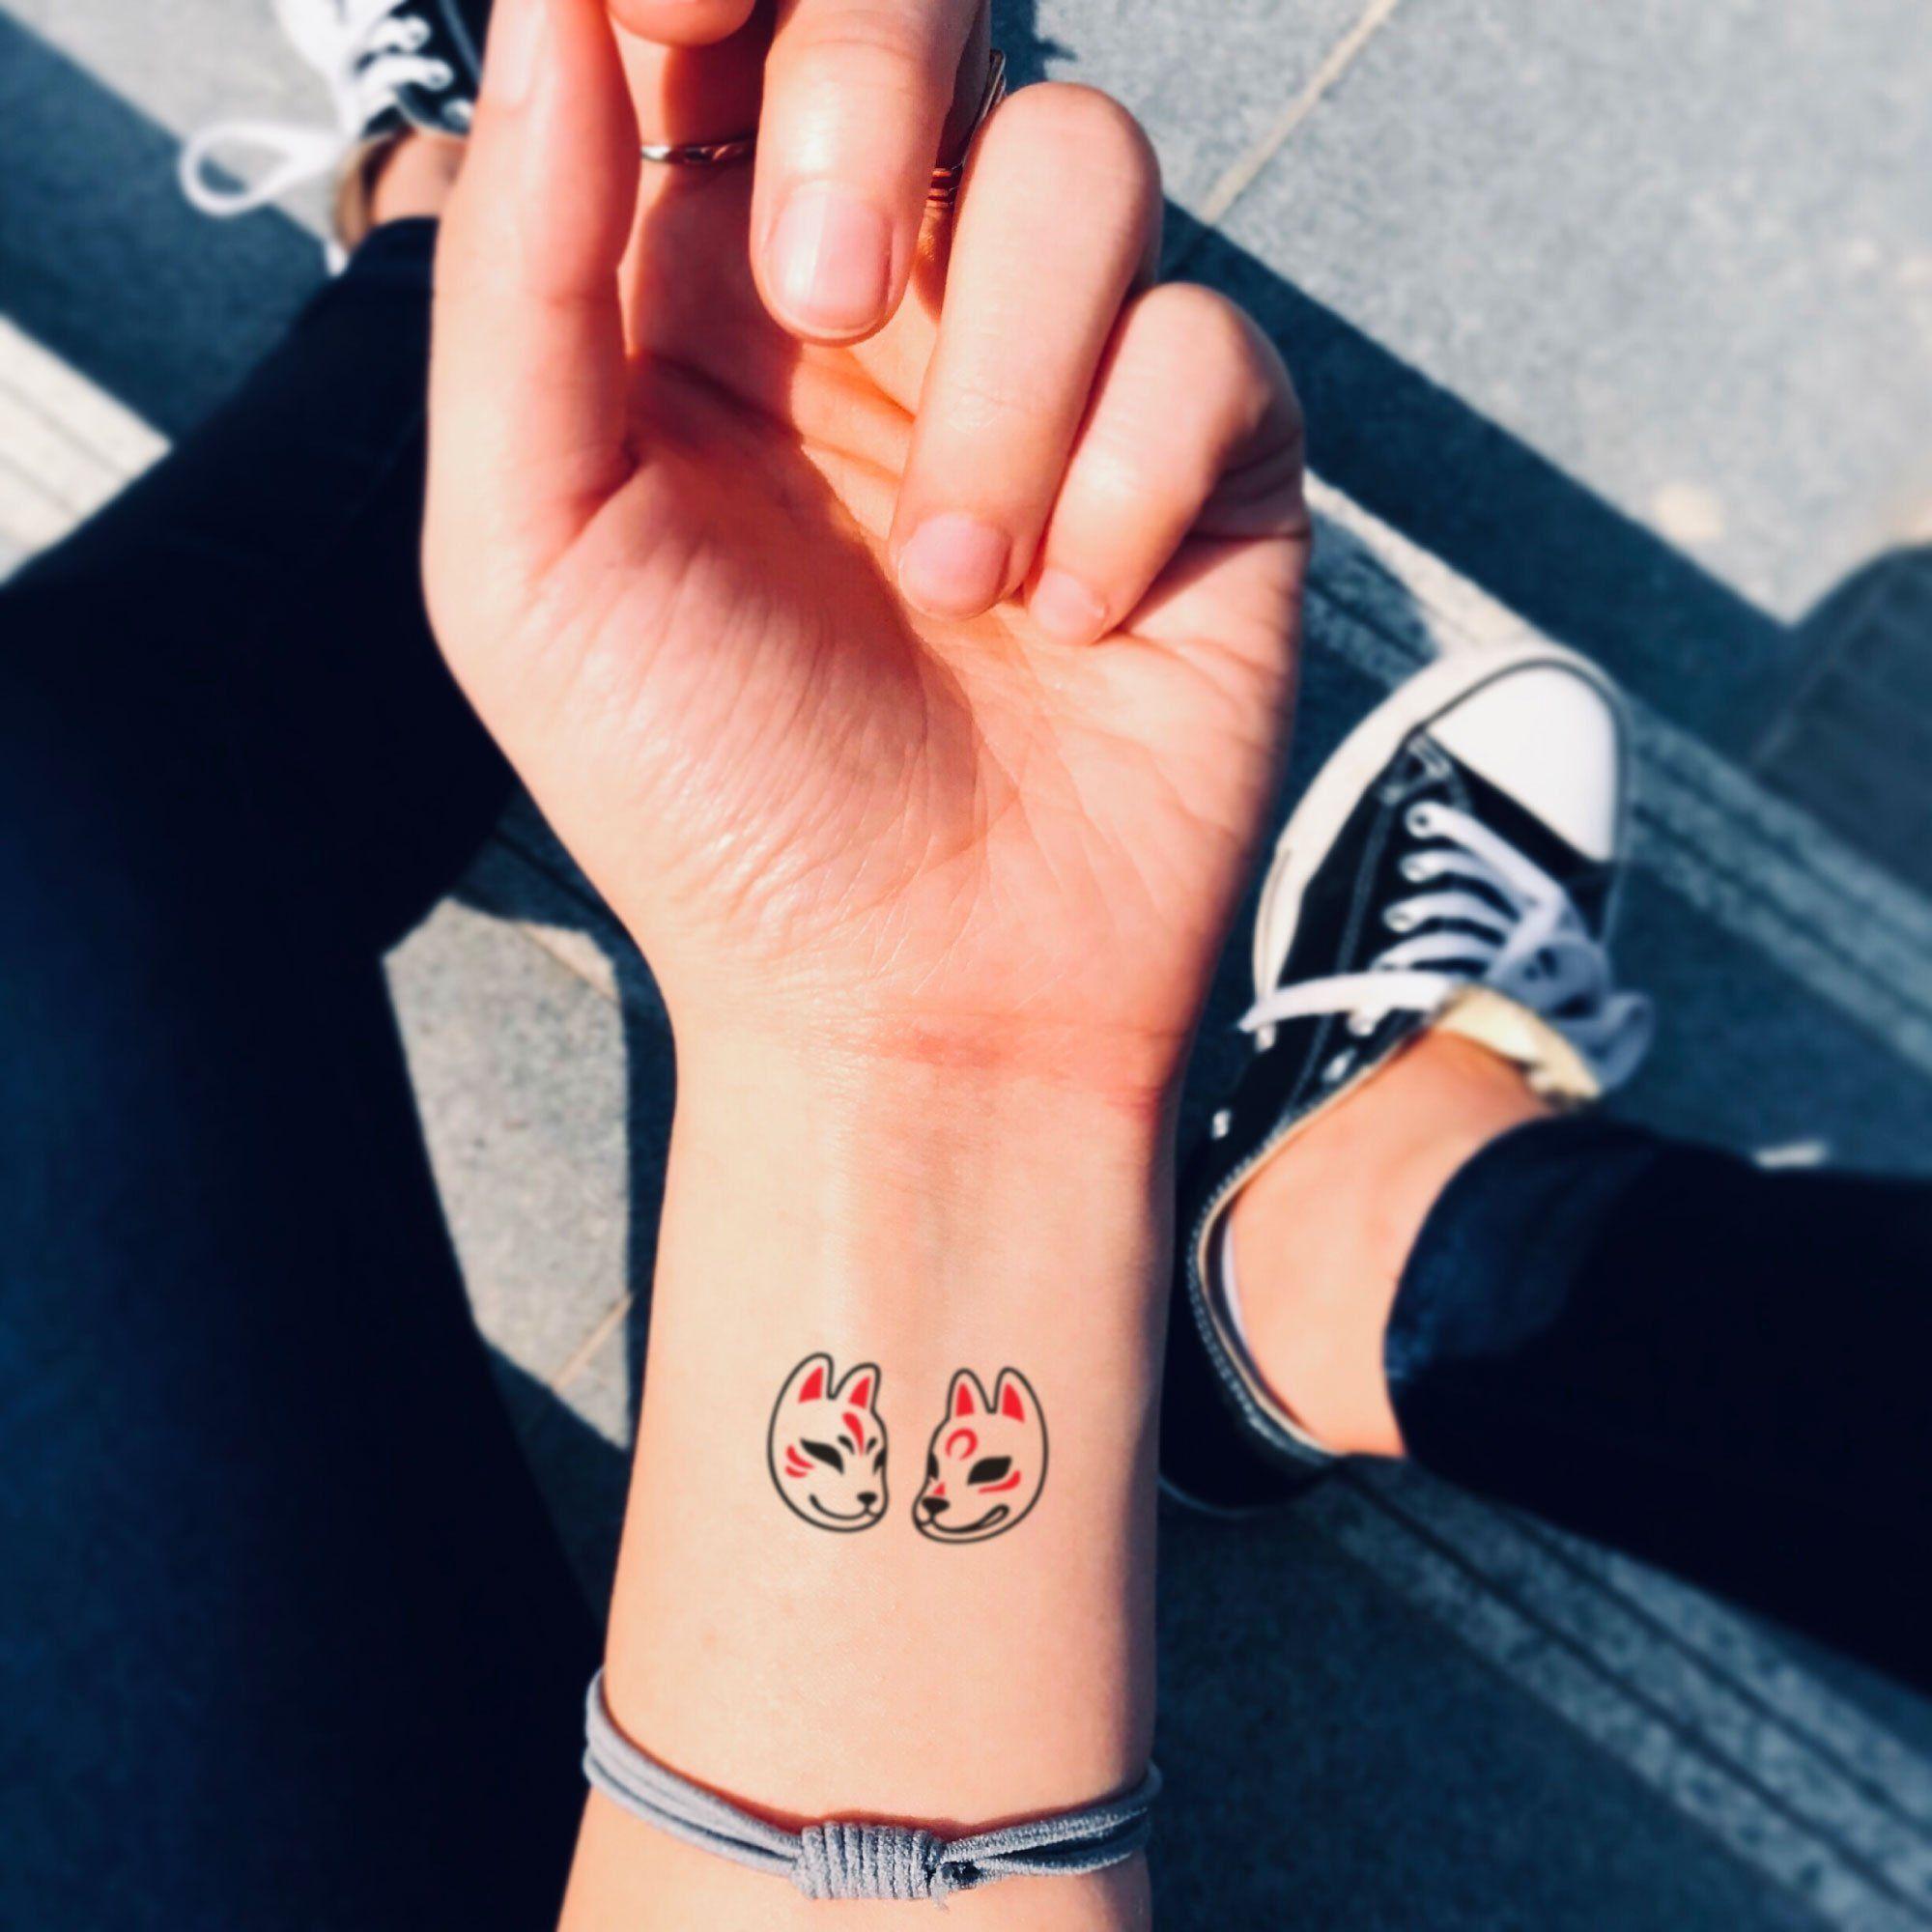 Japanese Kitsune Fox and Wolf Mask Temporary Tattoo Sticker (Set of 4) -   - #Fox #Ink #Japanese #JapaneseTattoos #Kitsune #mask #OpticalIllusions #Set #SkullTattoos #Sticker #Tattoo #temporary #Wolf